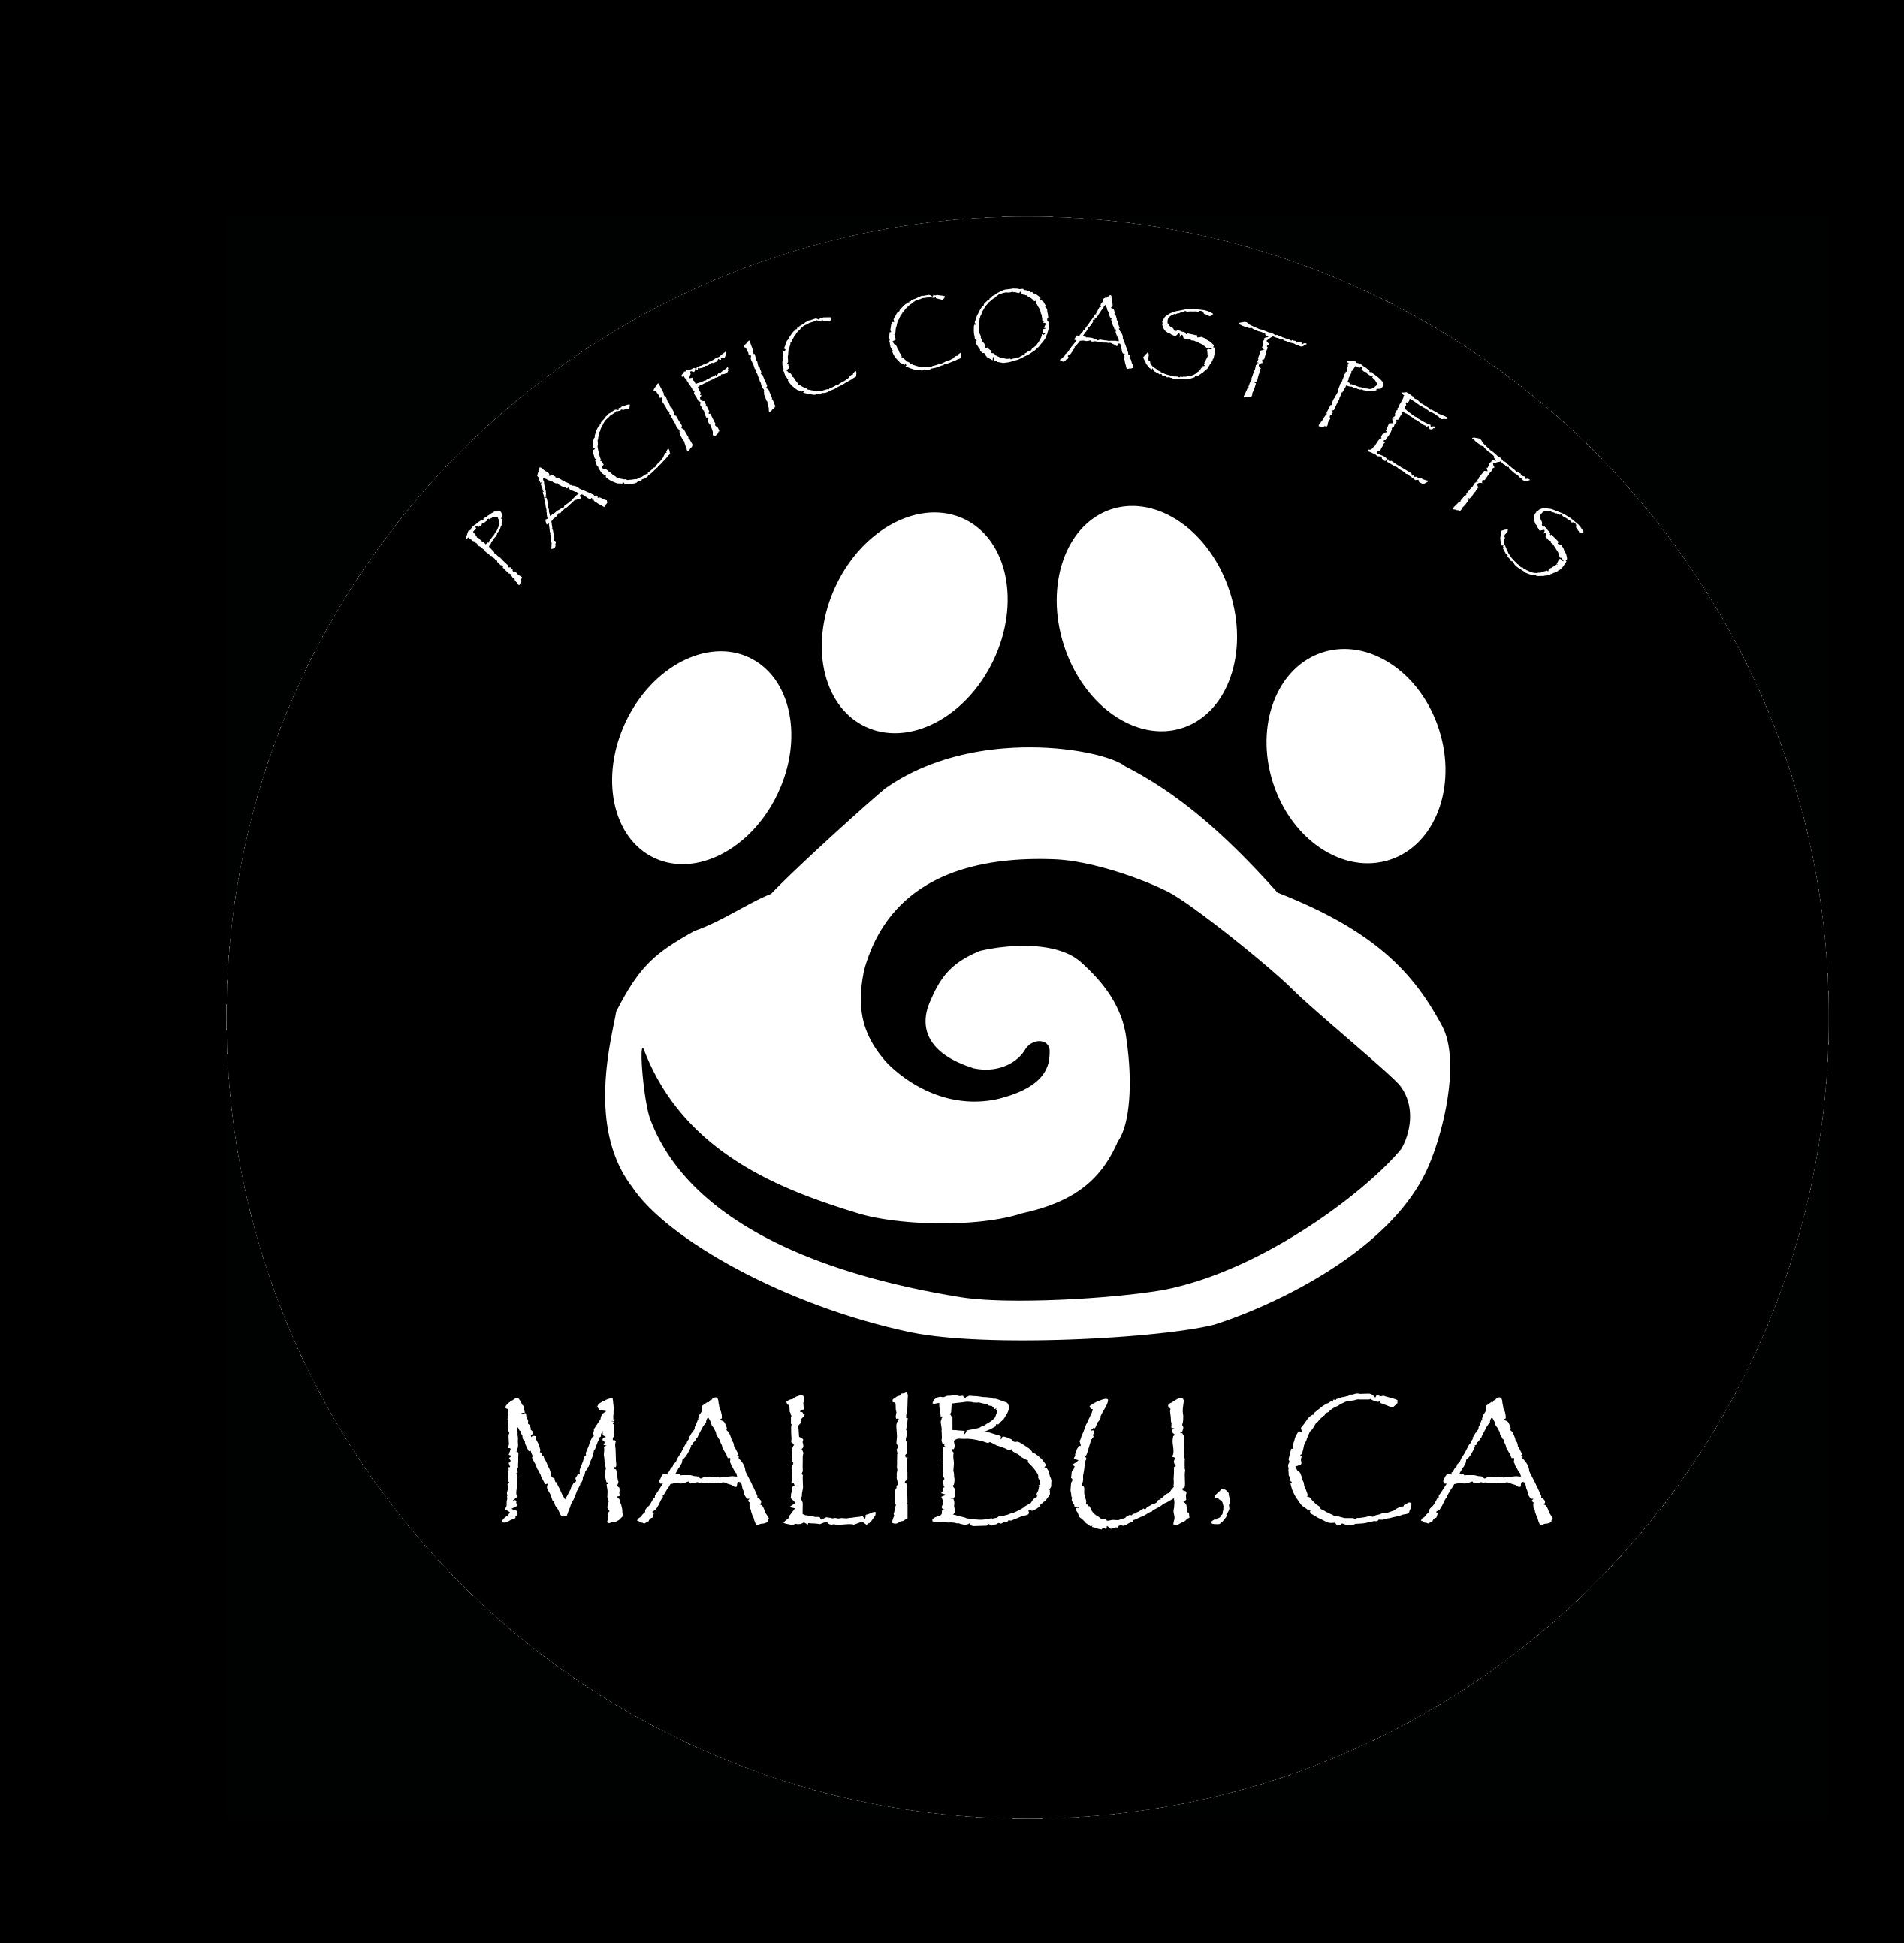 pascific-coast